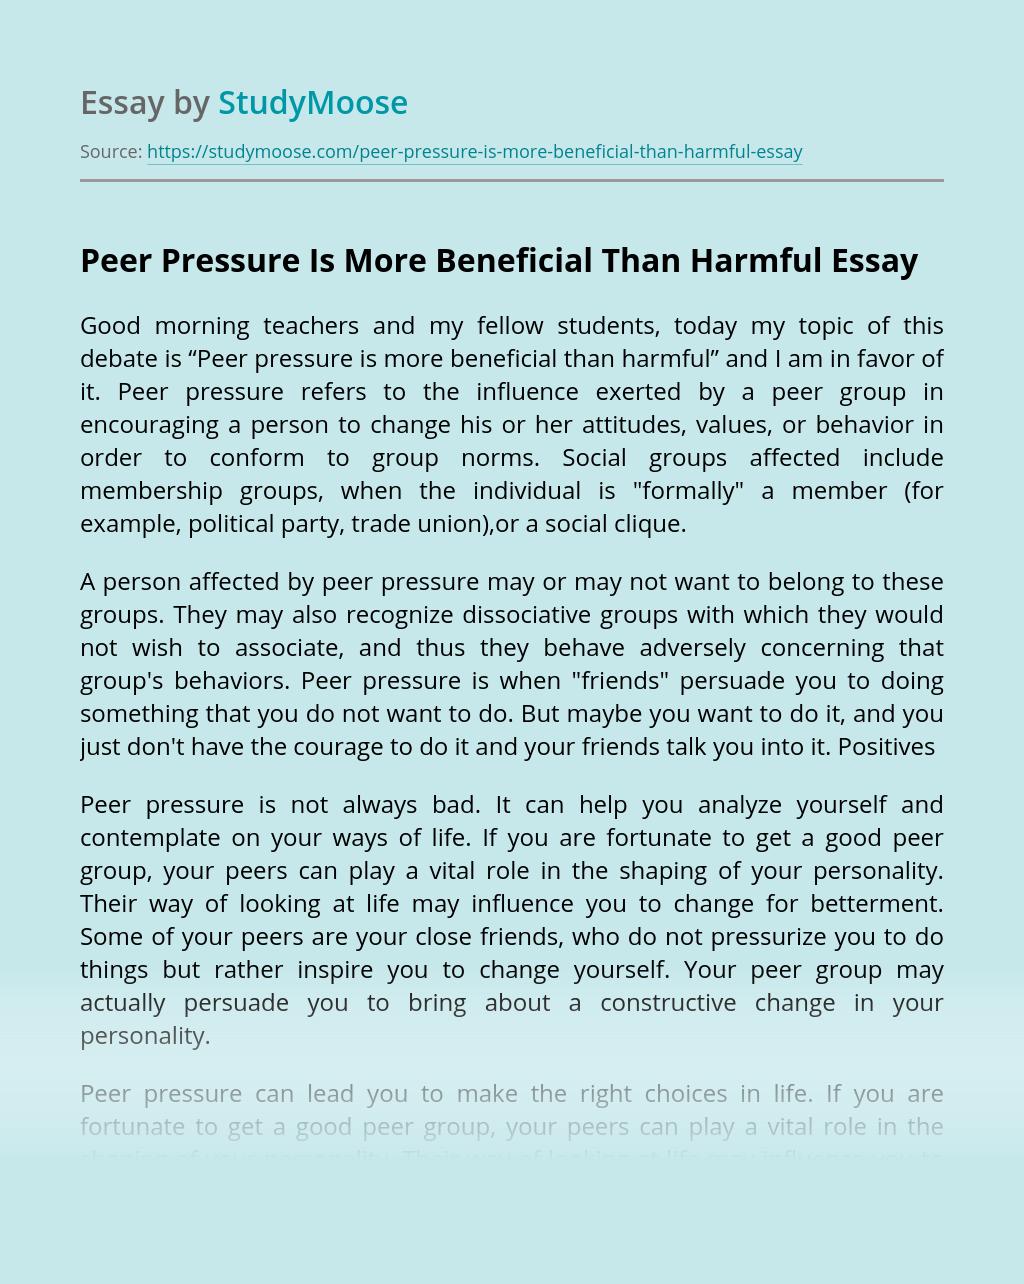 Peer Pressure Is More Beneficial Than Harmful